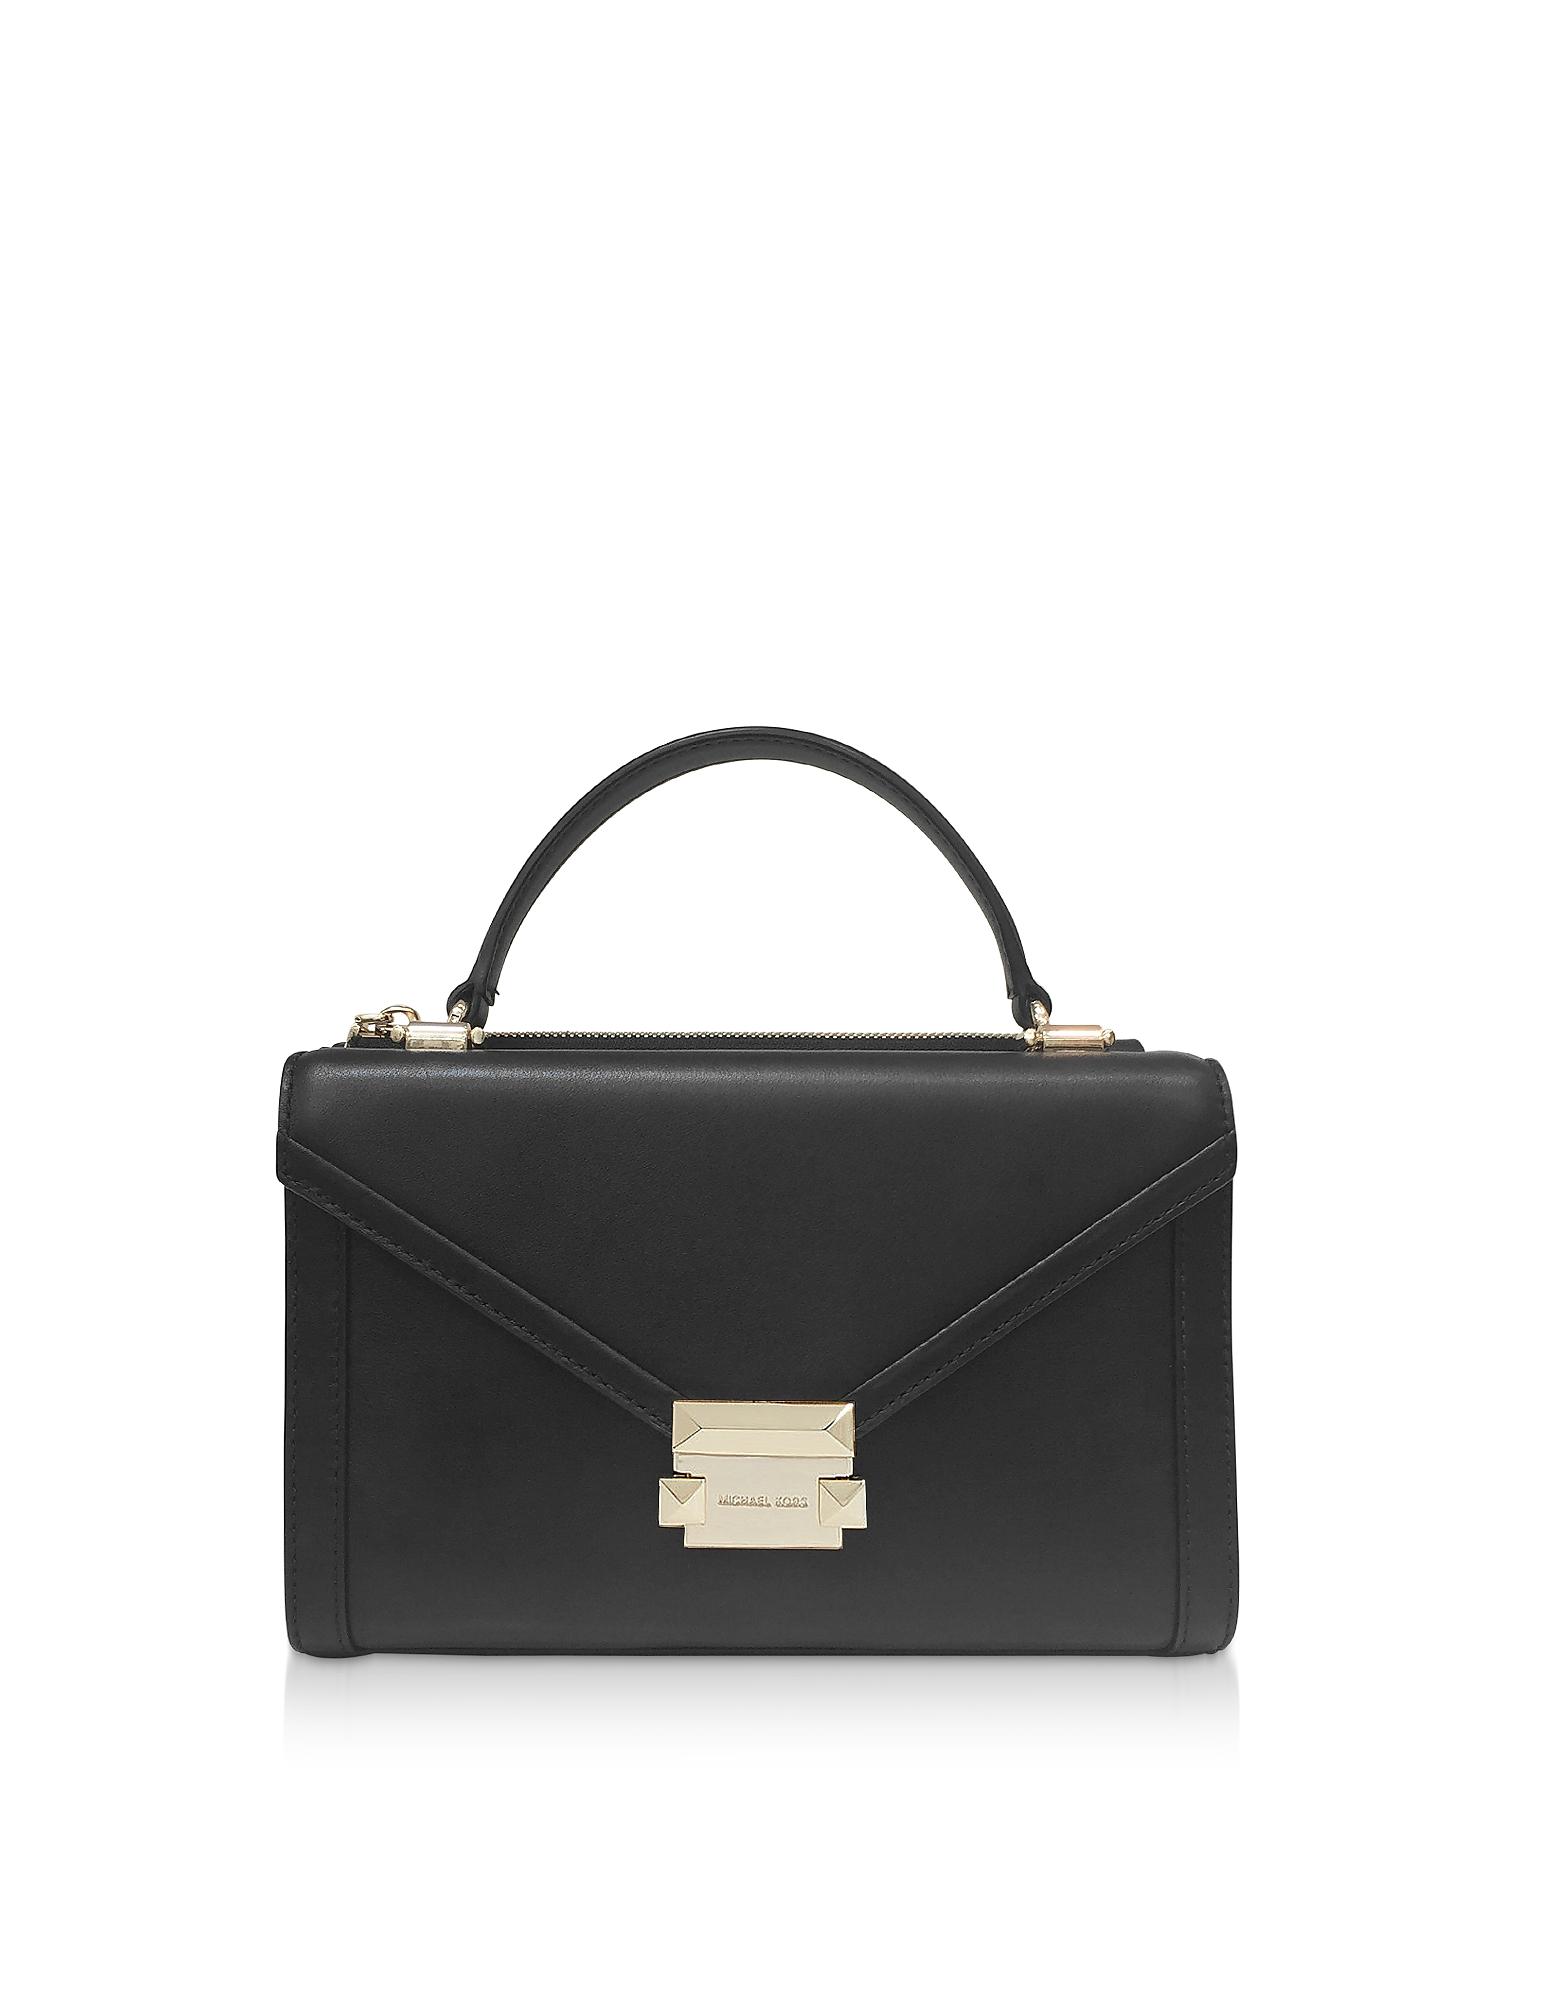 Whitney Small Convertible Top-Handle Messenger Bag